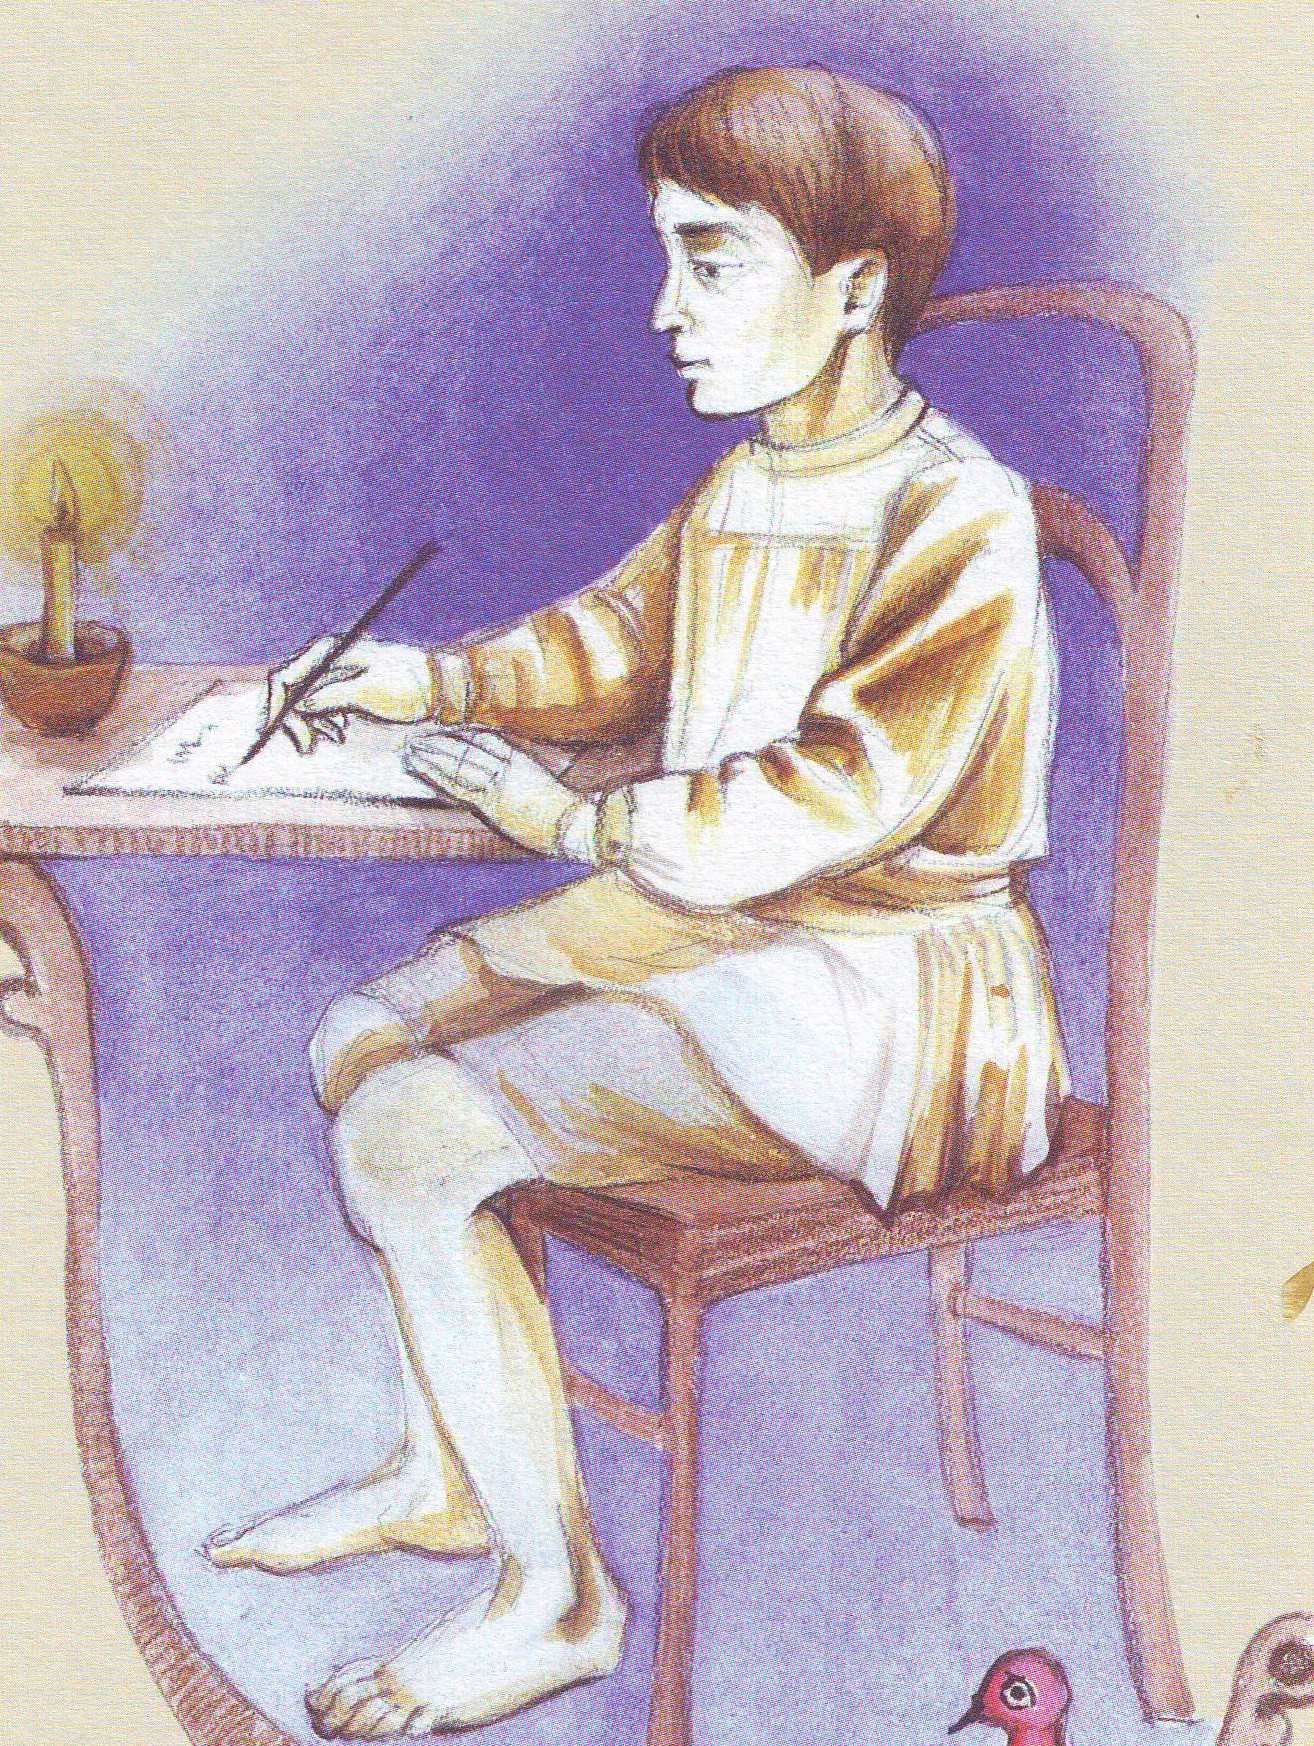 http://www.razbointrucuvant.ro/wp-content/uploads/2011/11/Sfantul-Nectarie-copil-ii-scrie-lui-Dumnezeu.jpg